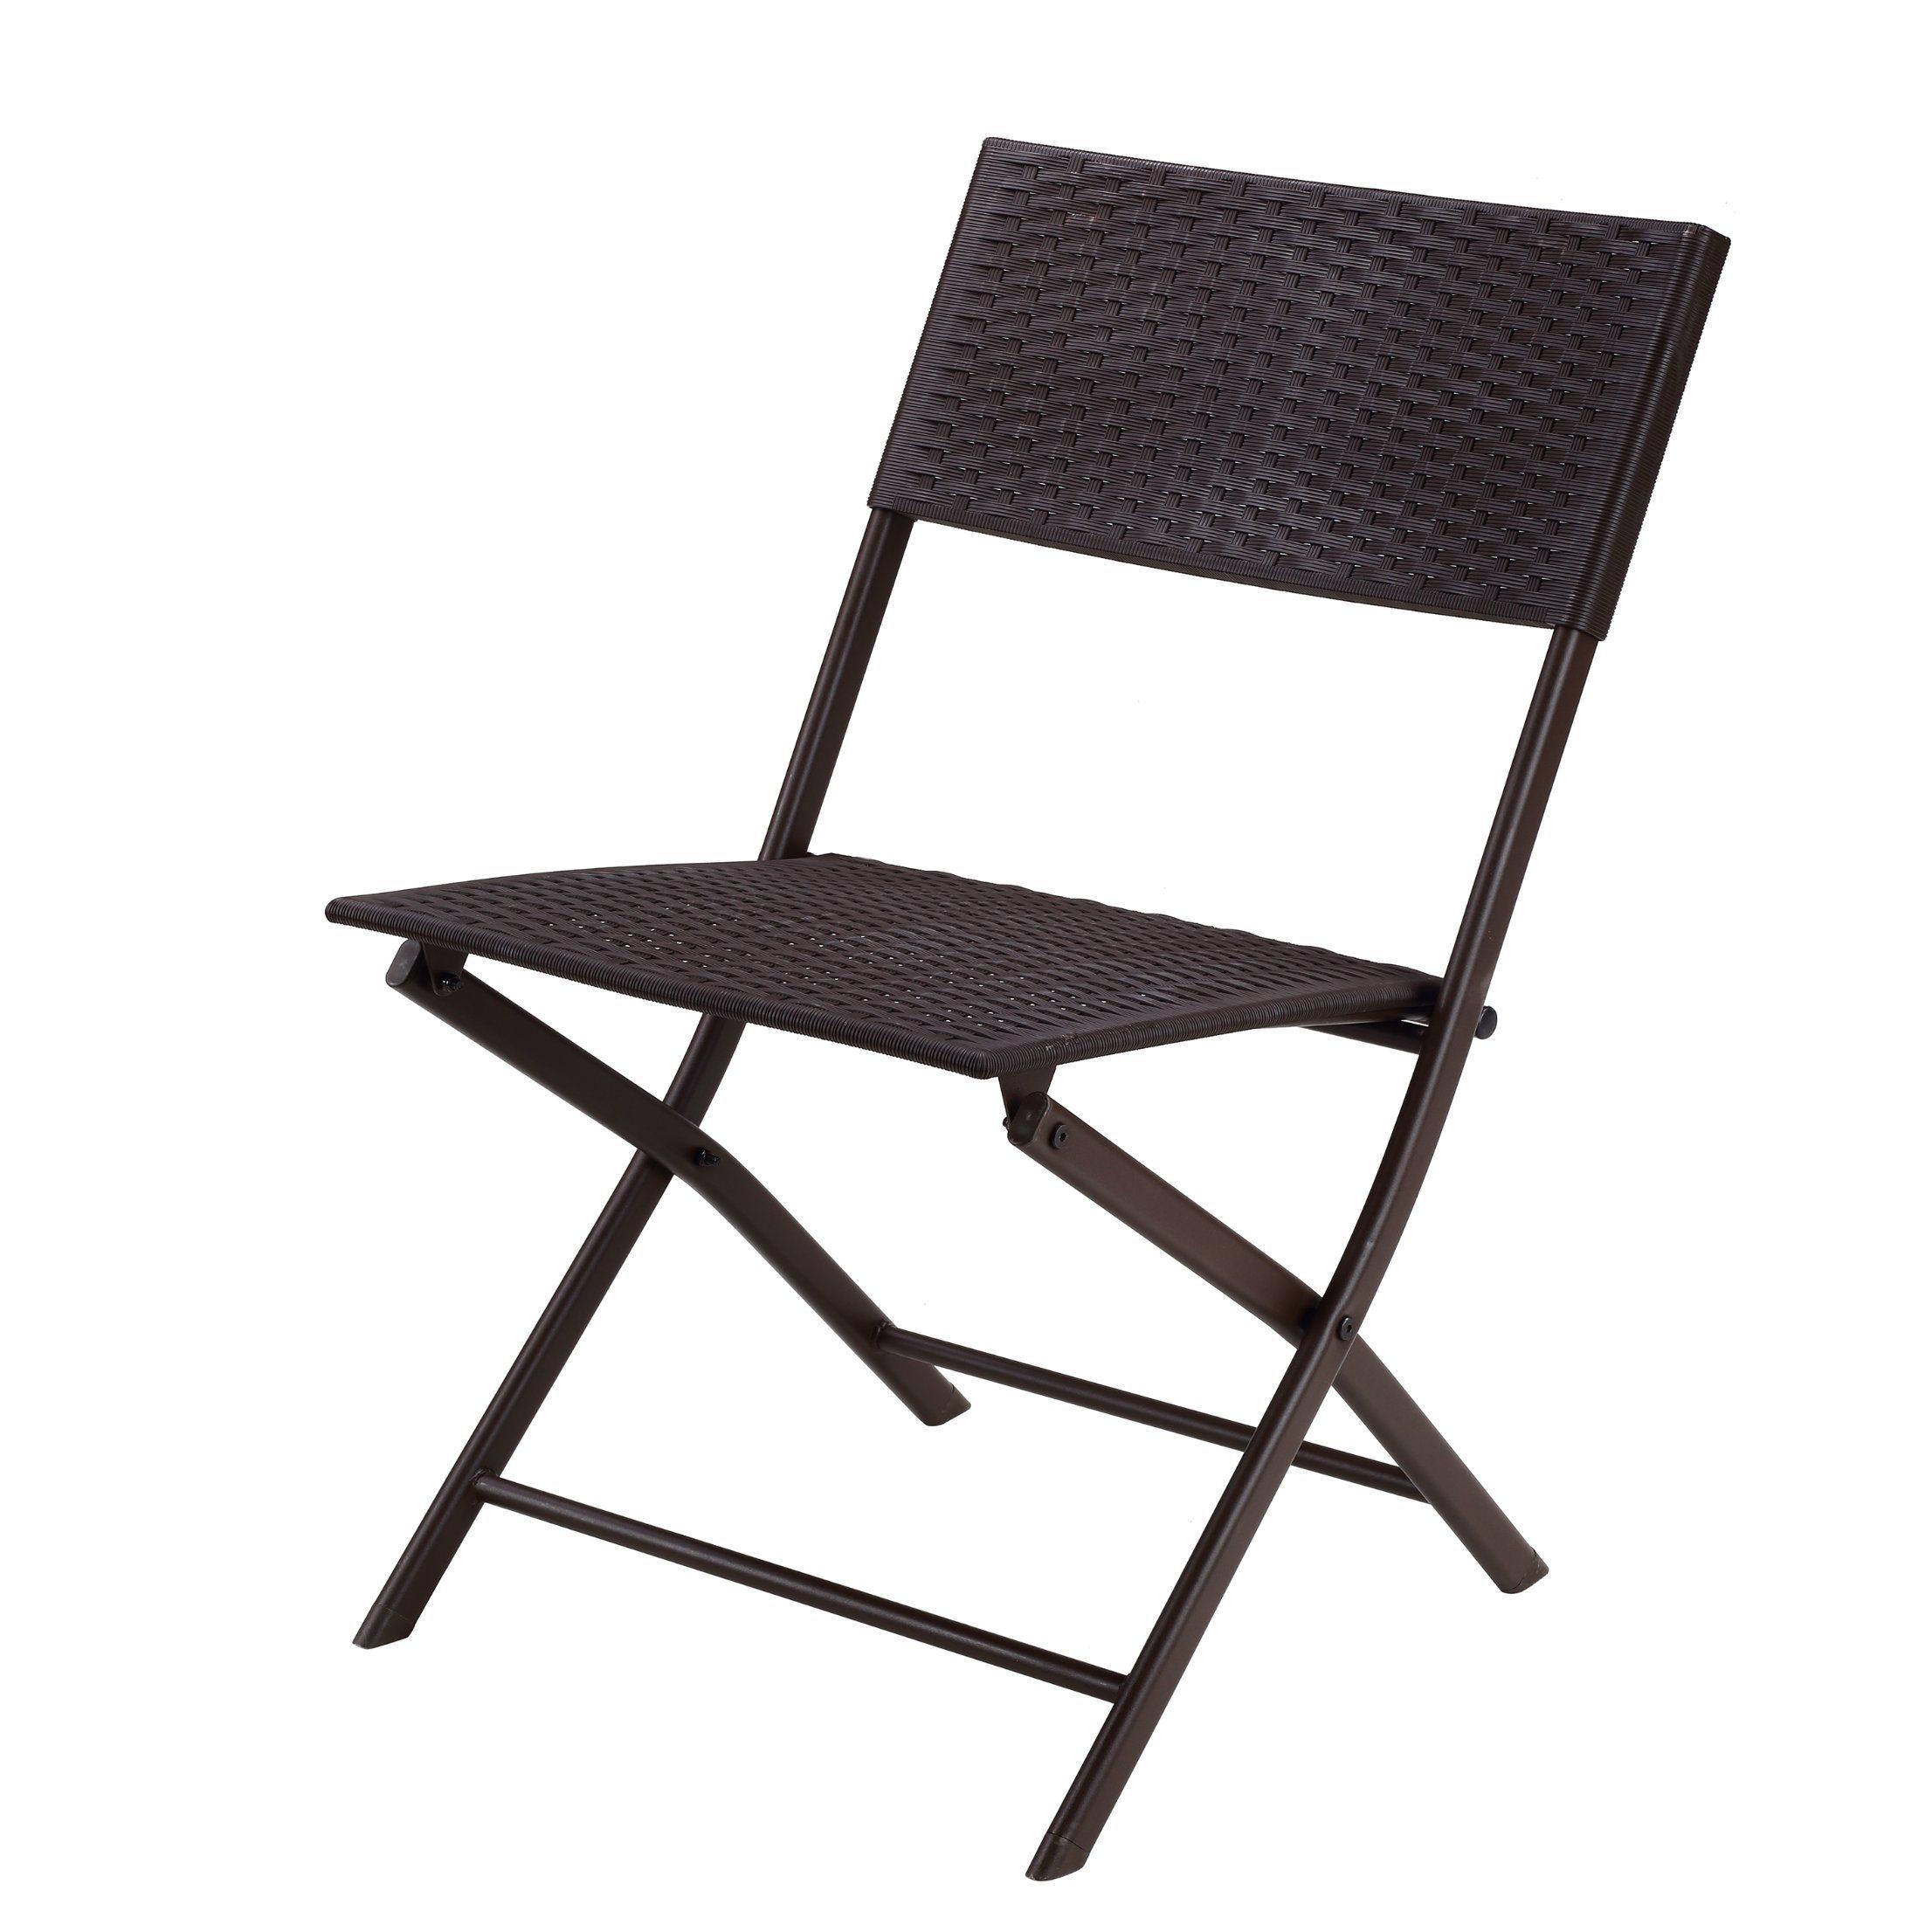 hot item garden event foldable plastic chair portable lifetime cheap outdoor patio furniture black plastic folding chairs